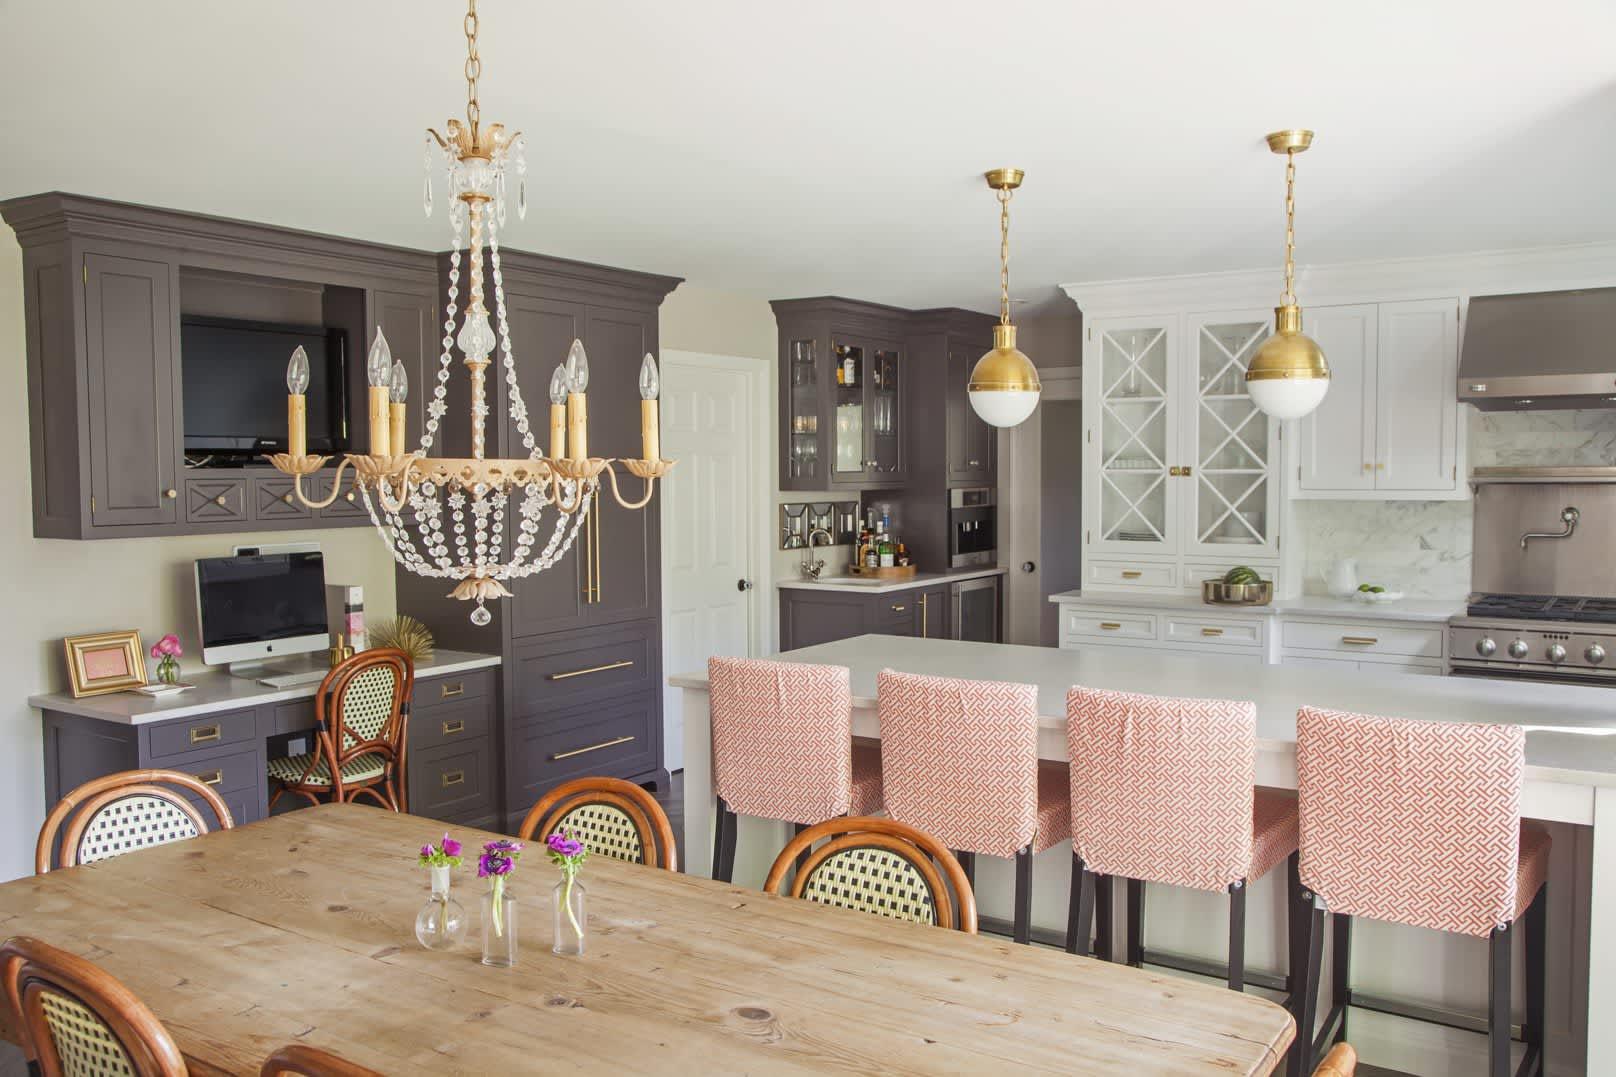 Gold studded kitchen